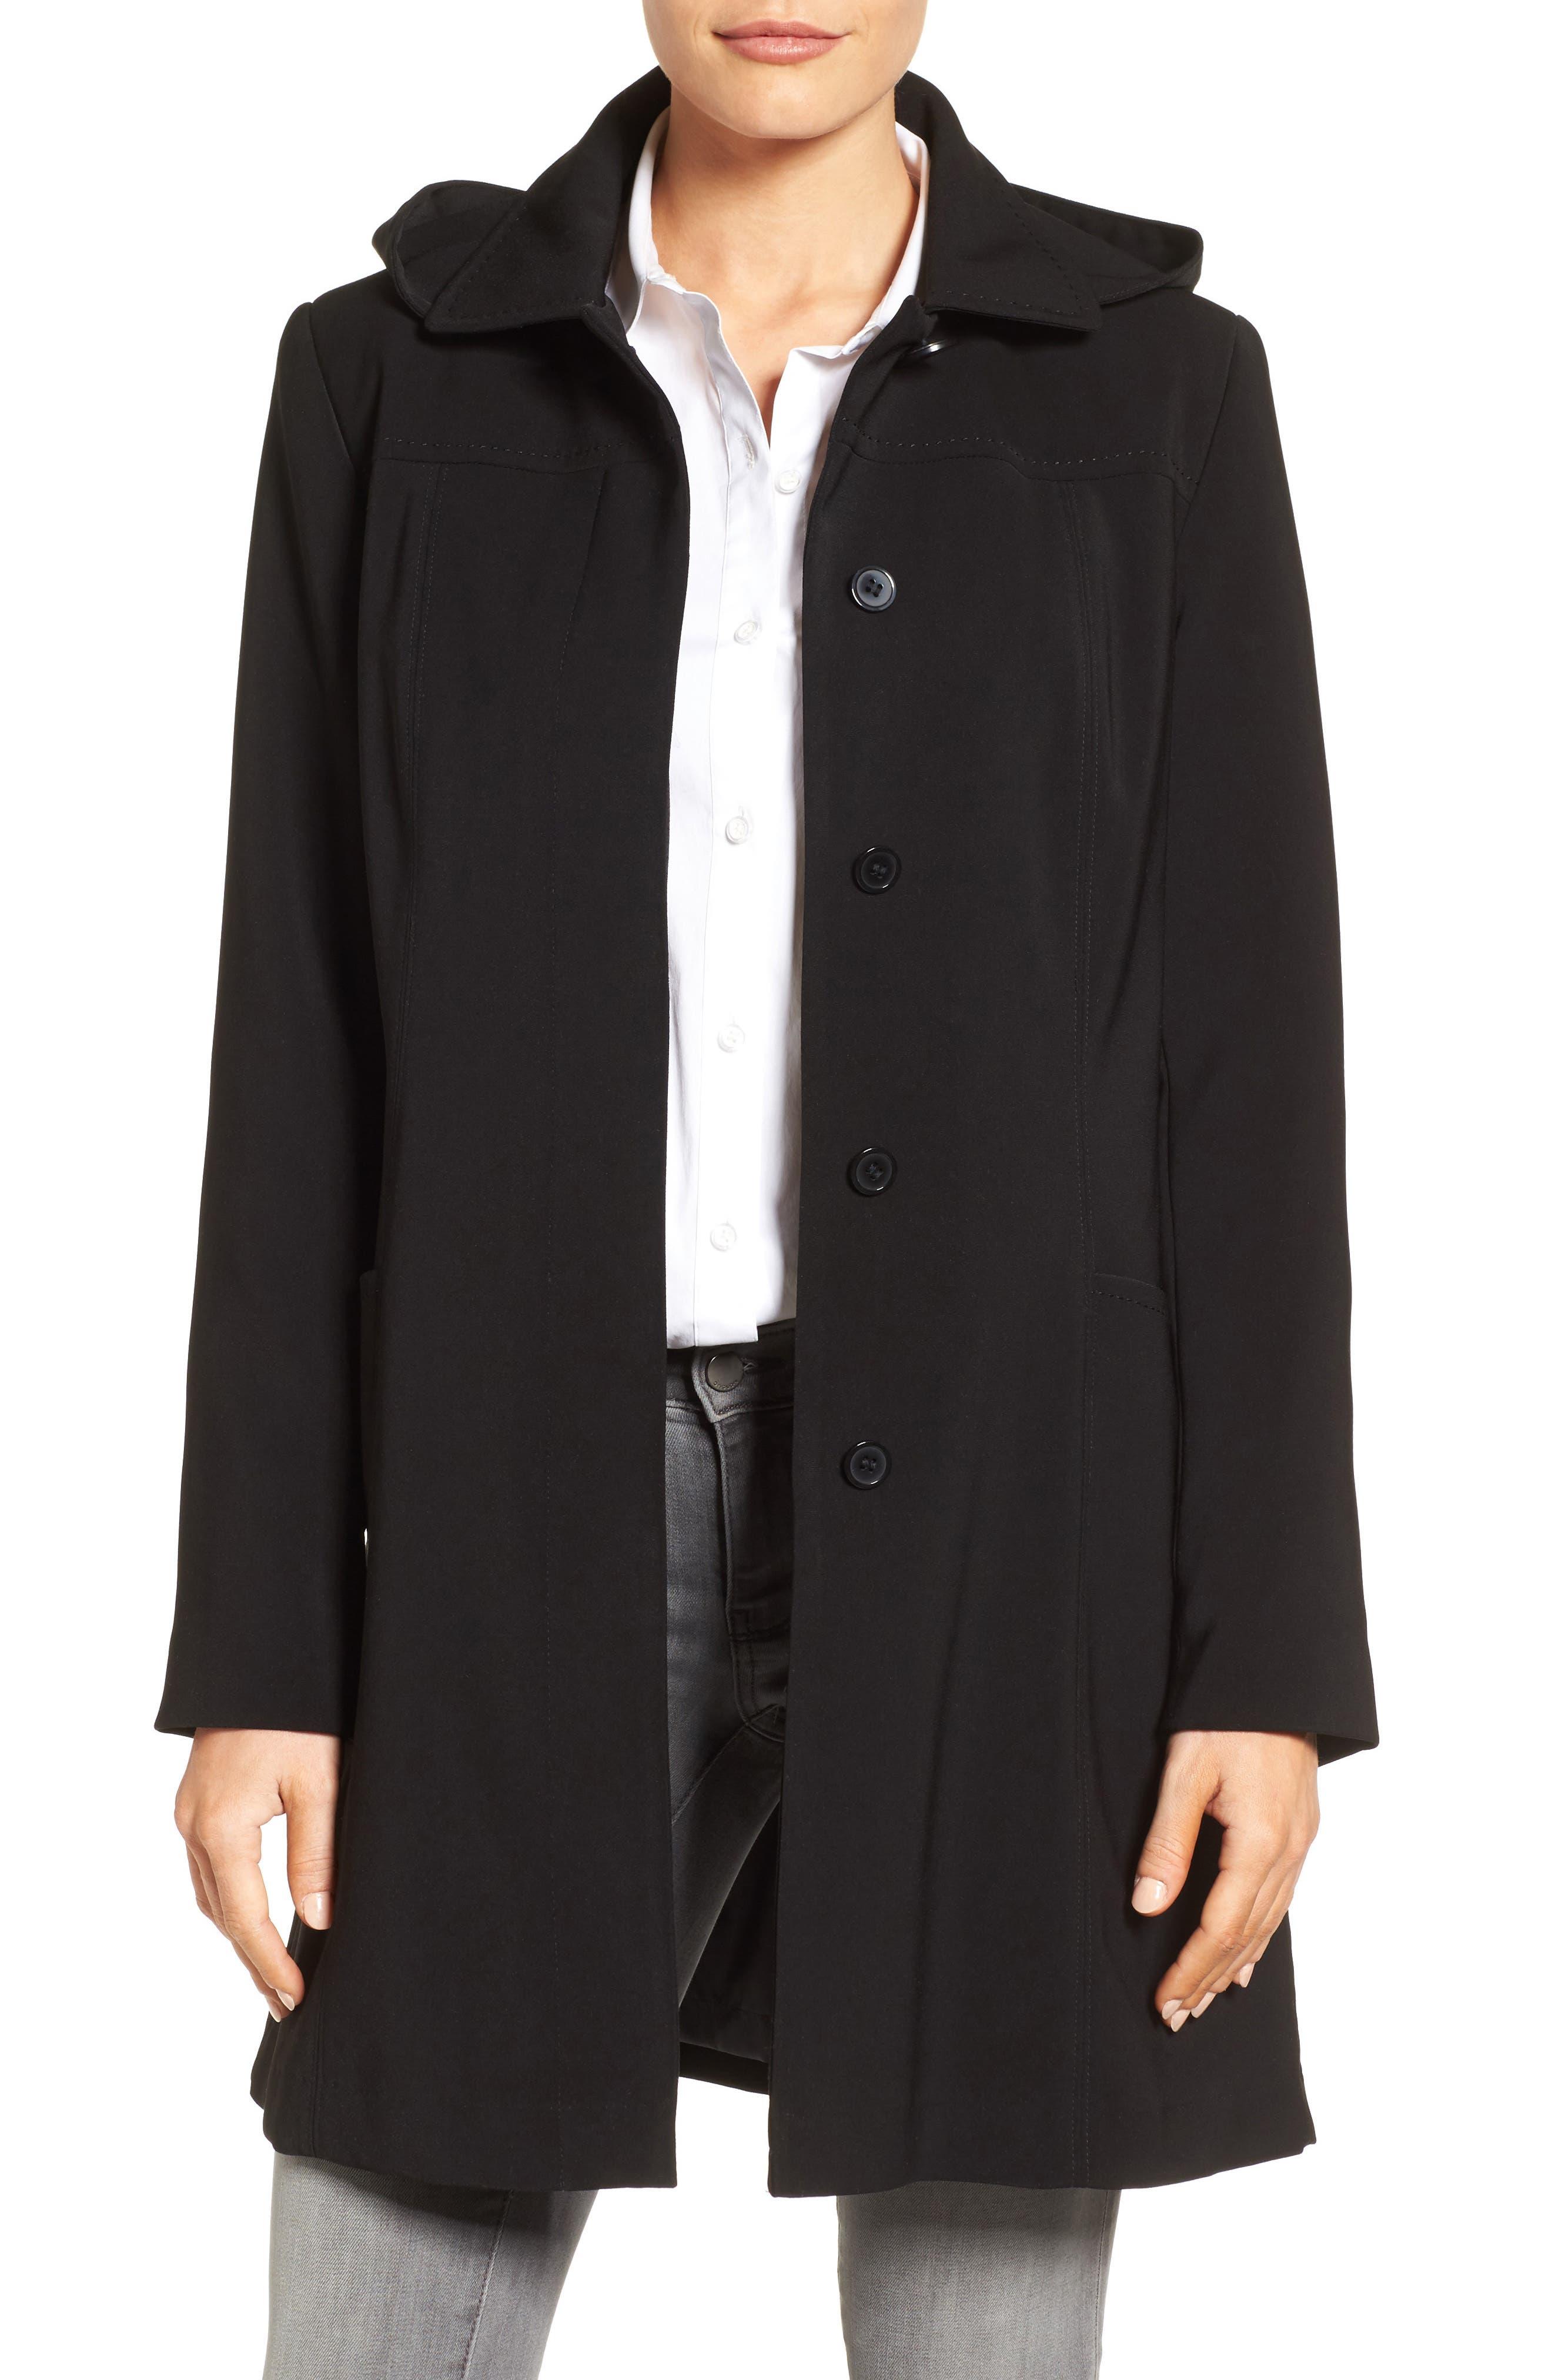 Alternate Image 1 Selected - Gallery Pickstitch Nepage Walking Coat with Detachable Hood (Regular & Petite)